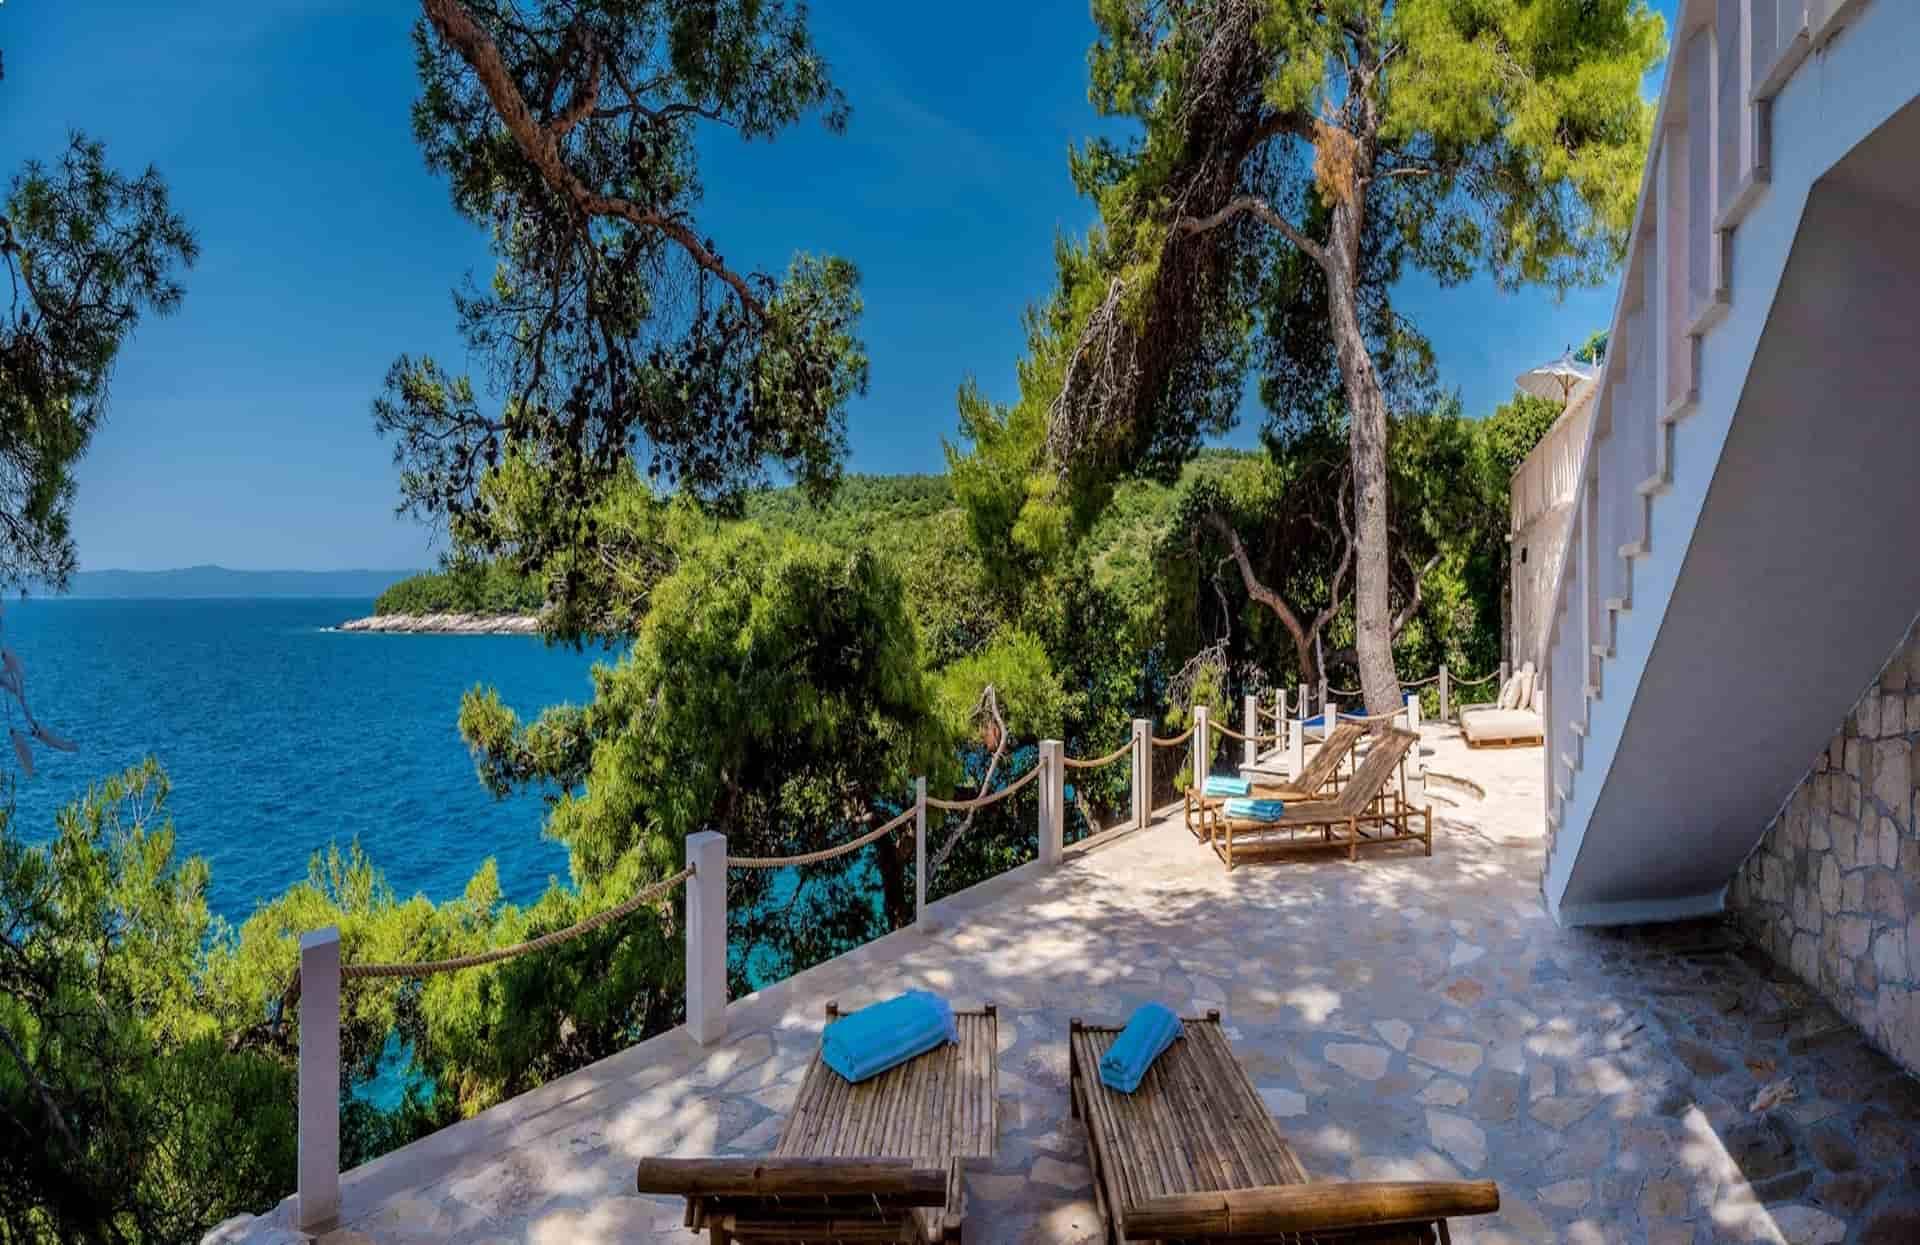 Vila na plaži okružena prekrasnom prirodom